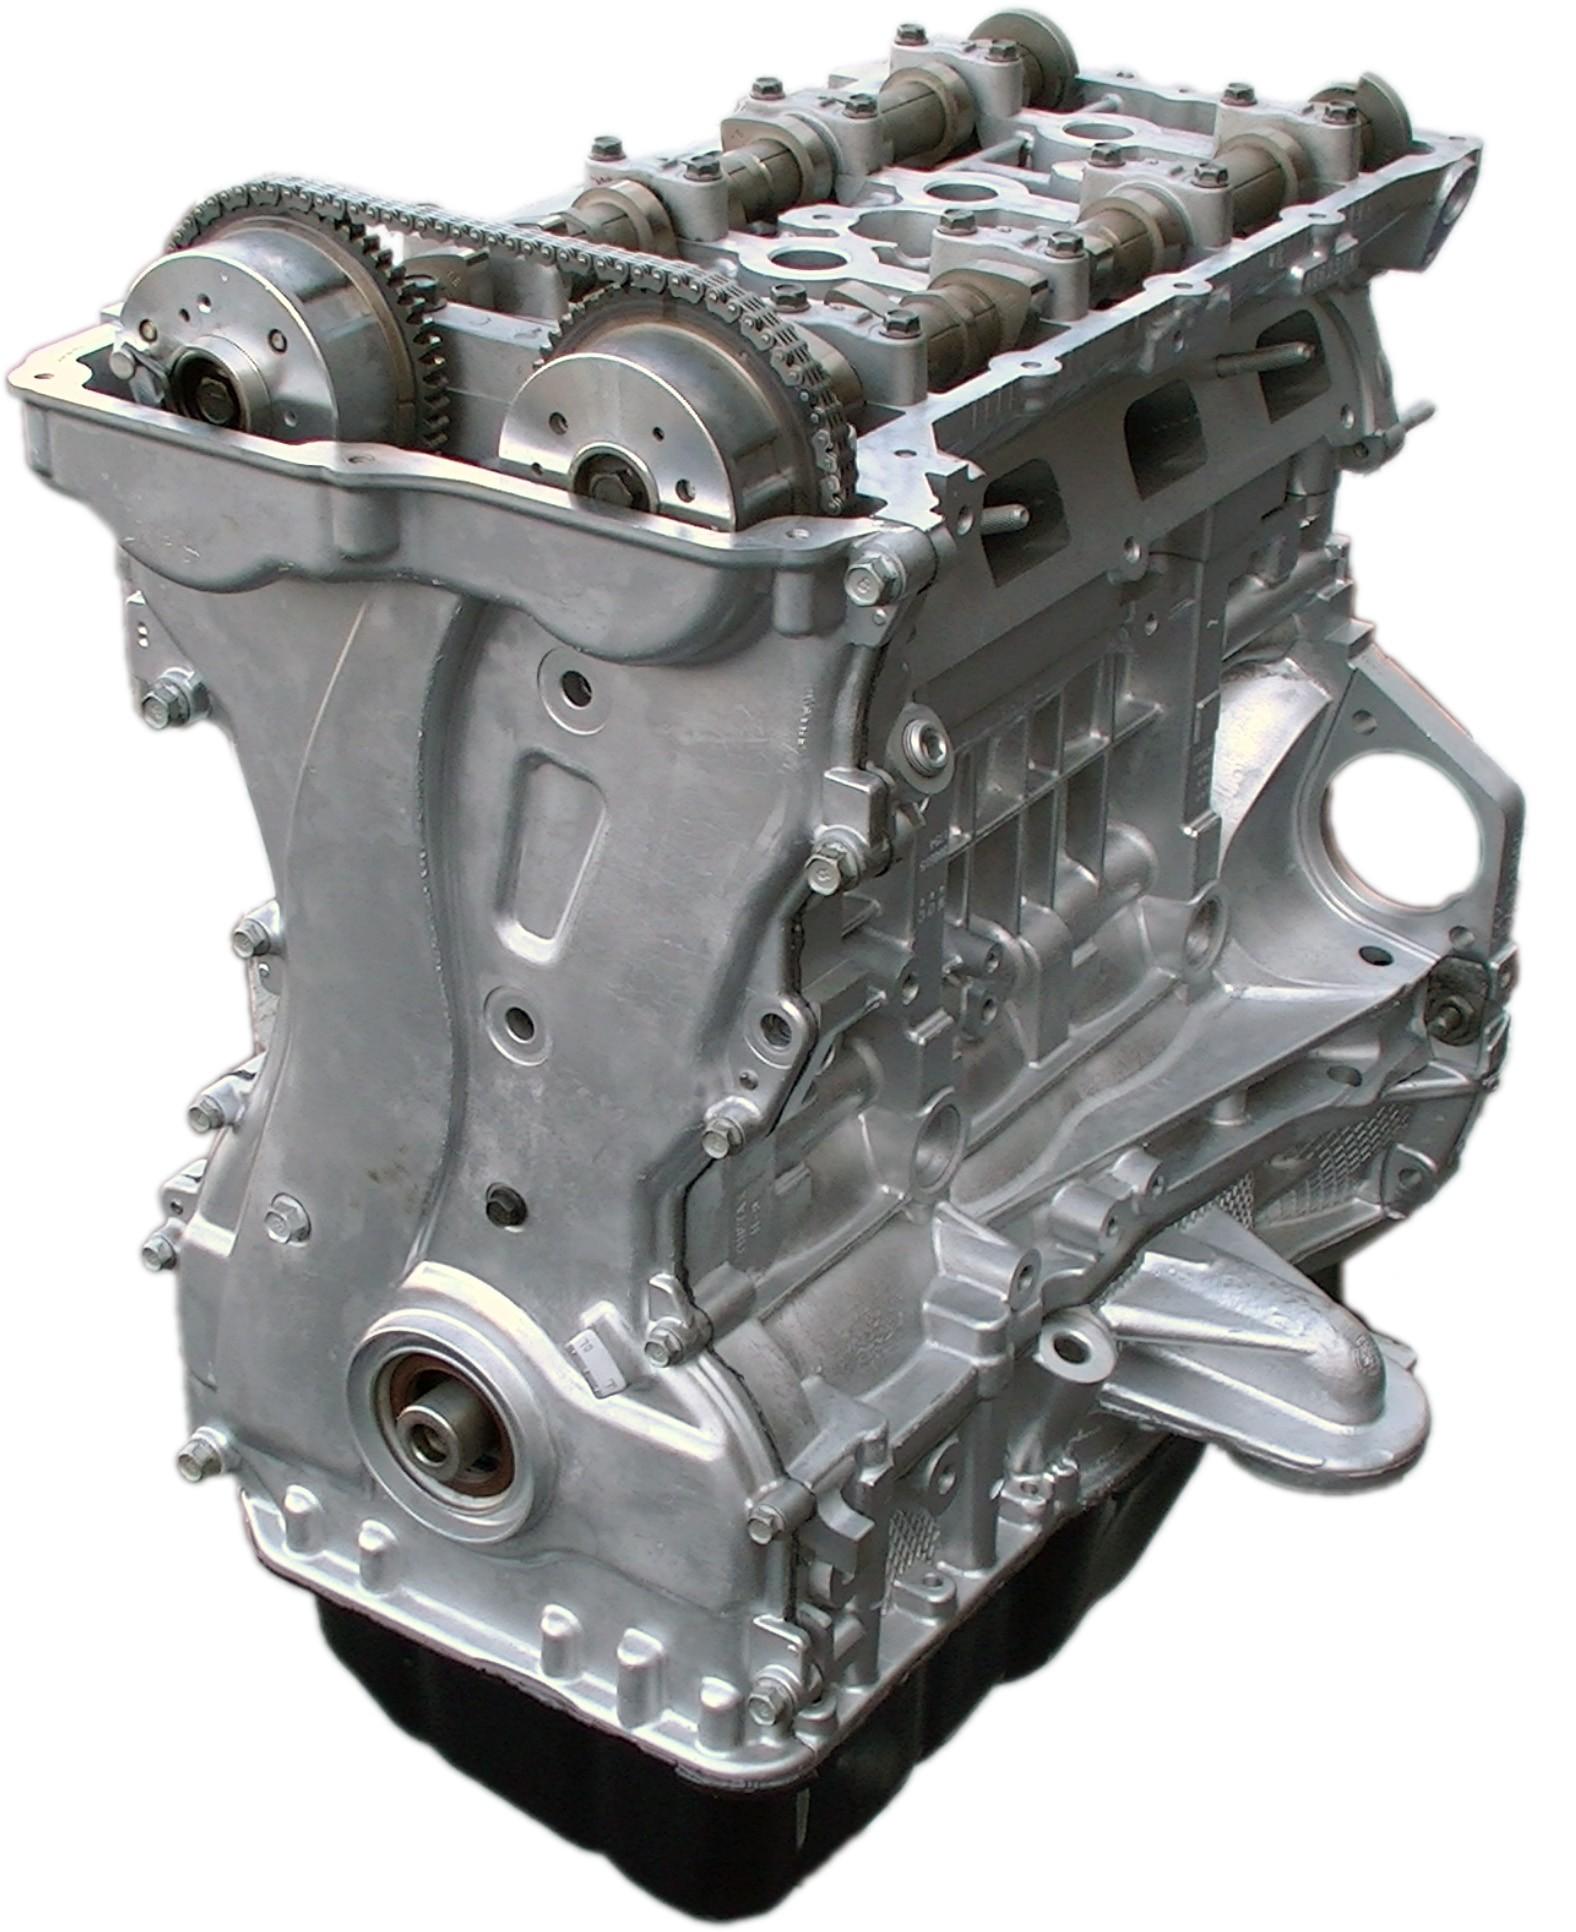 Rebuilt 09 10 Kia Optima 4cyl 2 4l Dohc Engine 171 Kar King Auto